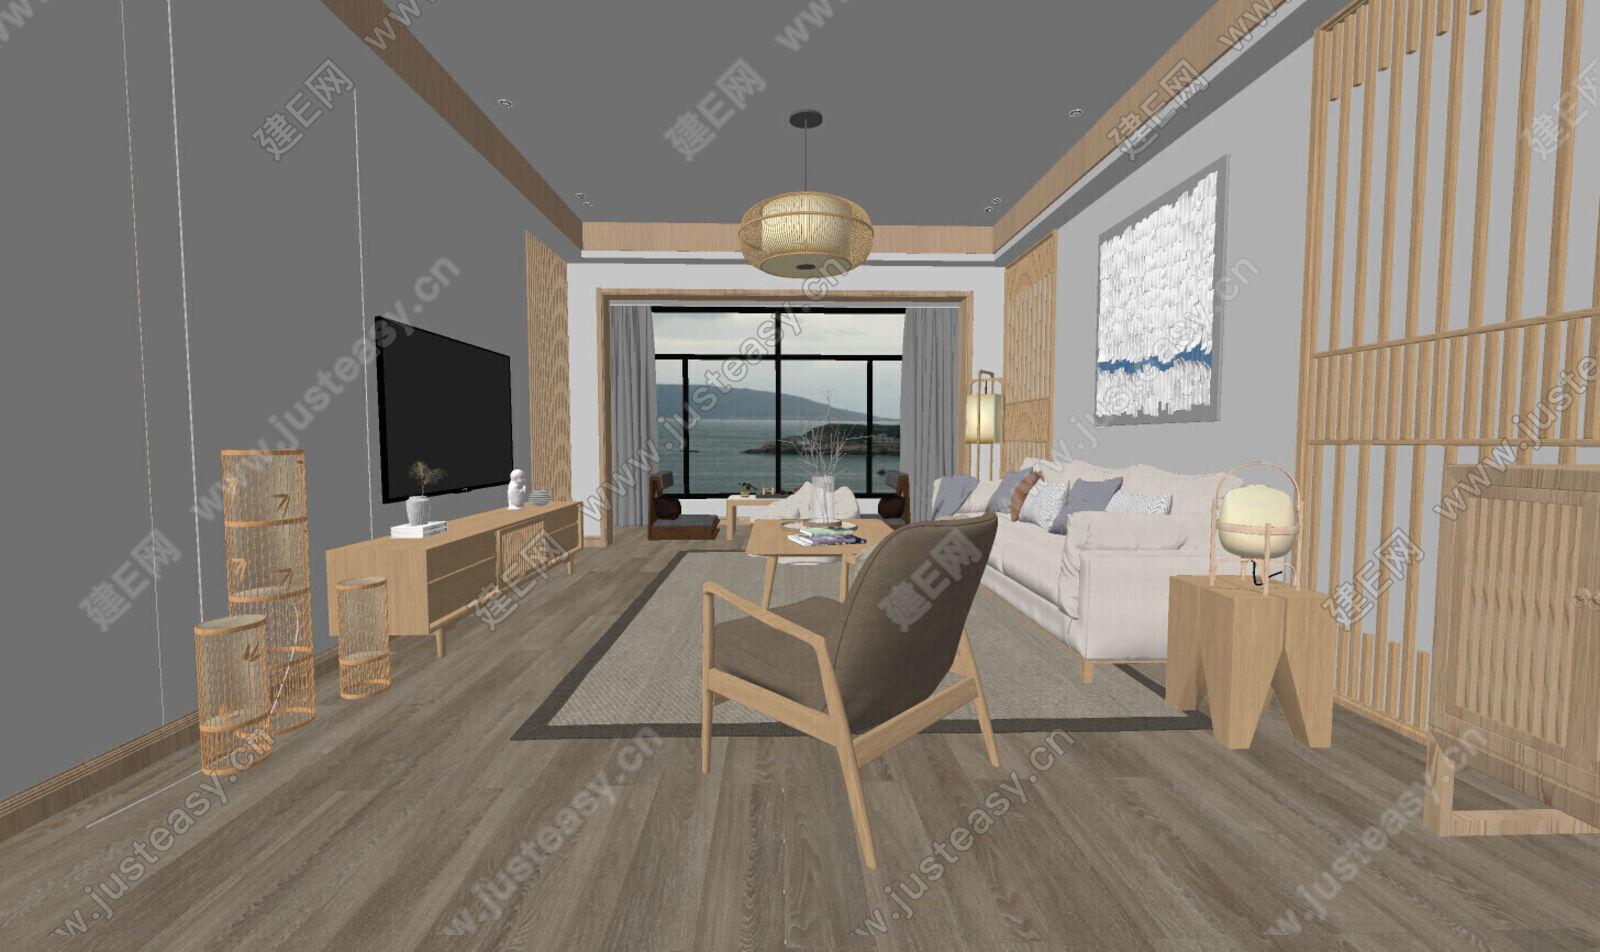 日式客厅sketchup模型